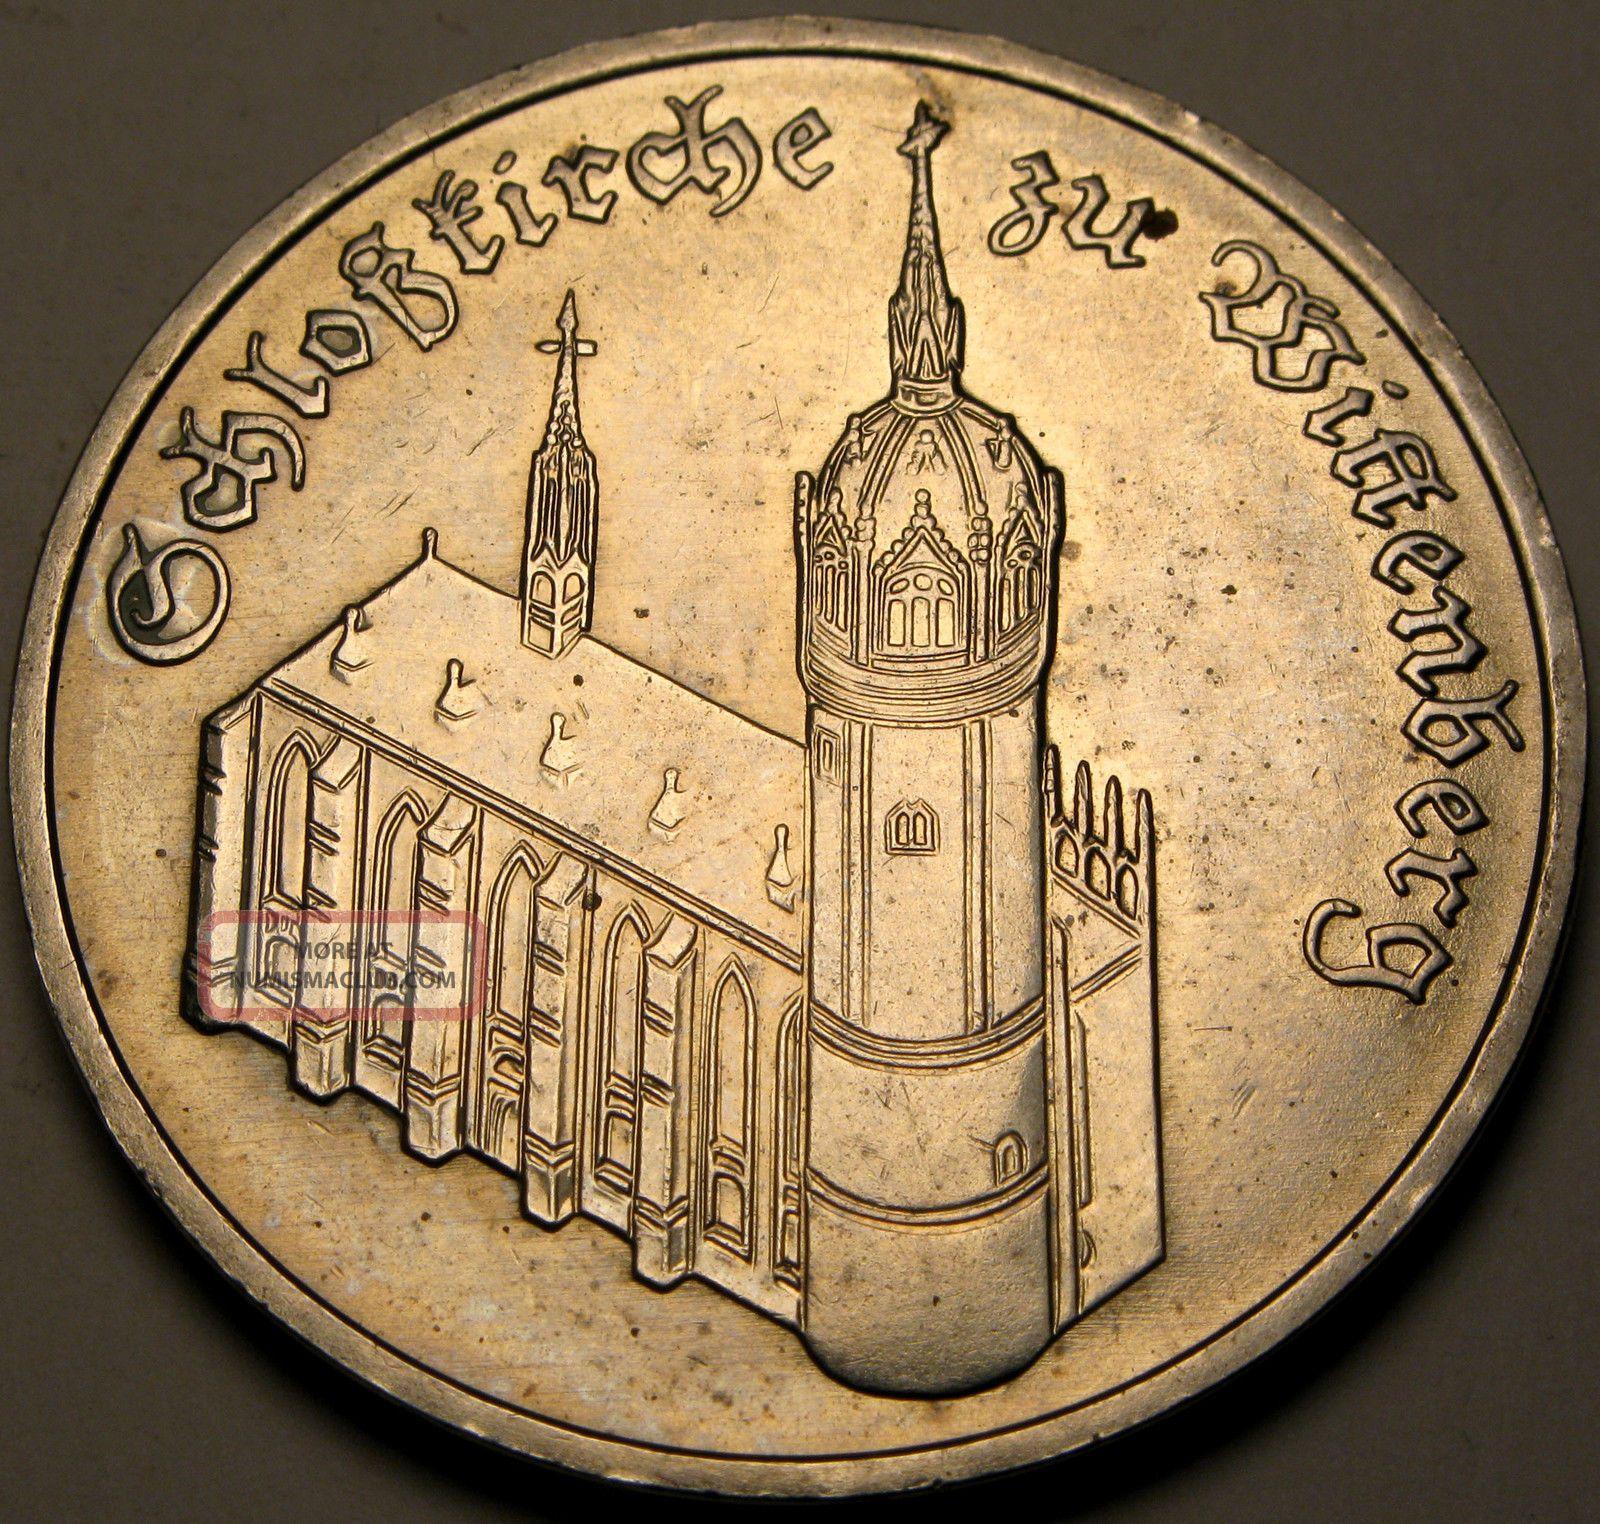 Germany (ddr) 5 Mark 1983 A - Copper/nickel - Wittenberg Church - Xf/aunc - 2674 Germany photo